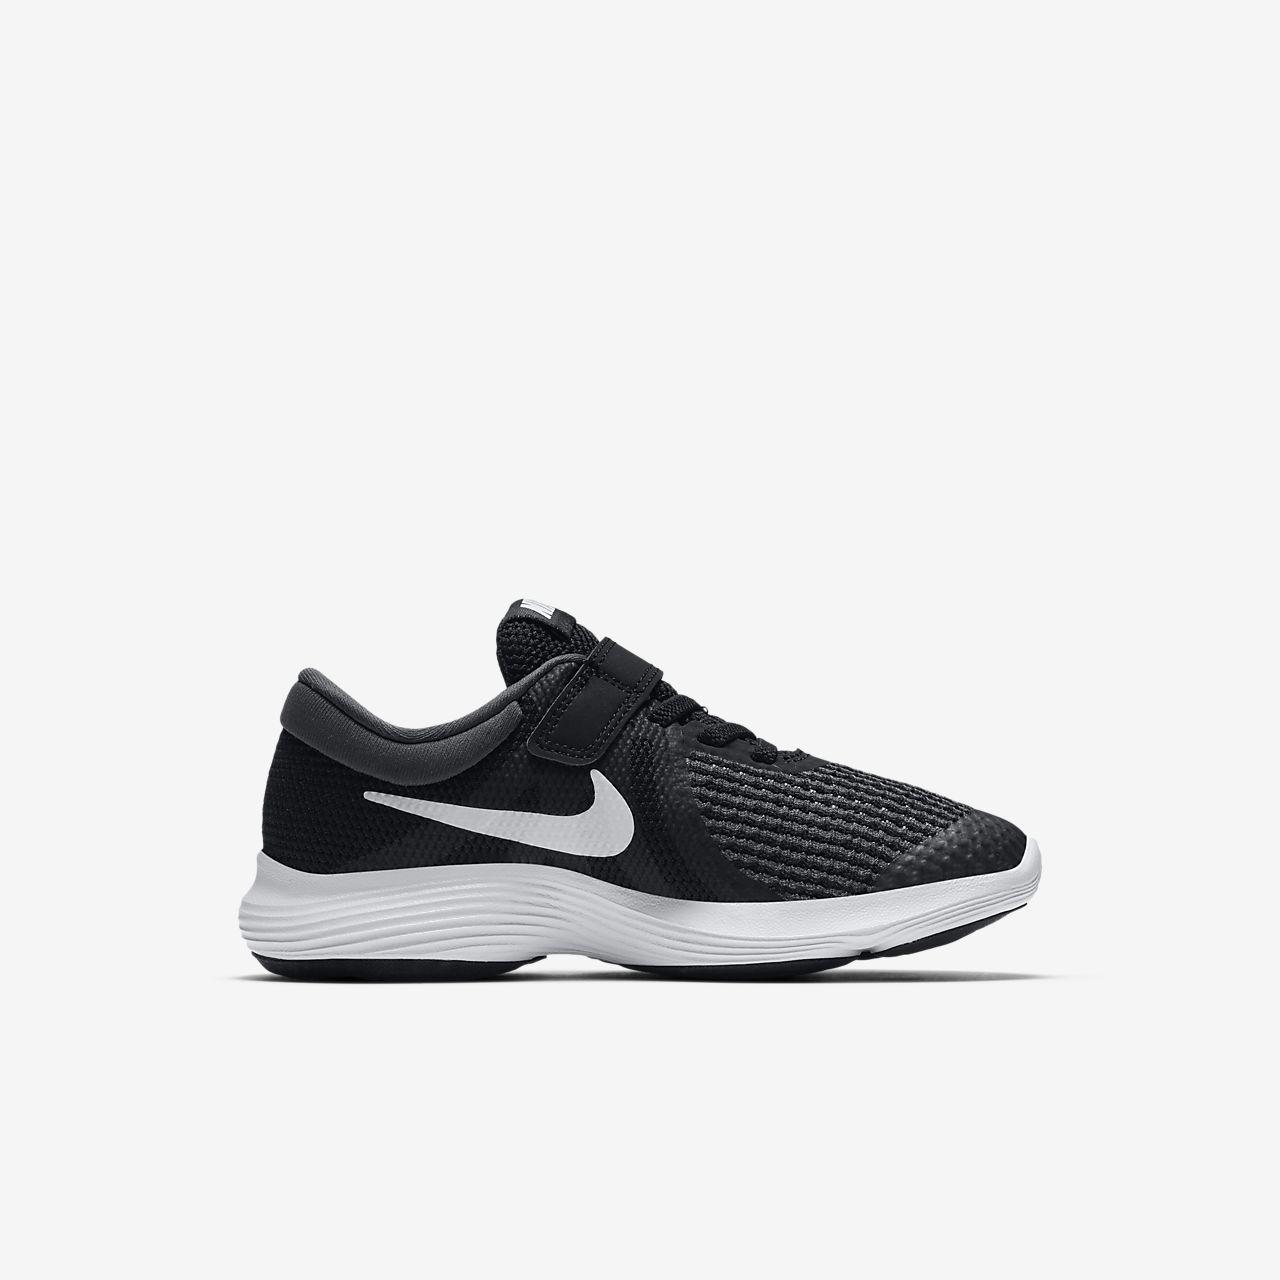 Nike Revolution 4 Schuh für jüngere Kinder - Schwarz E1kj4Ii